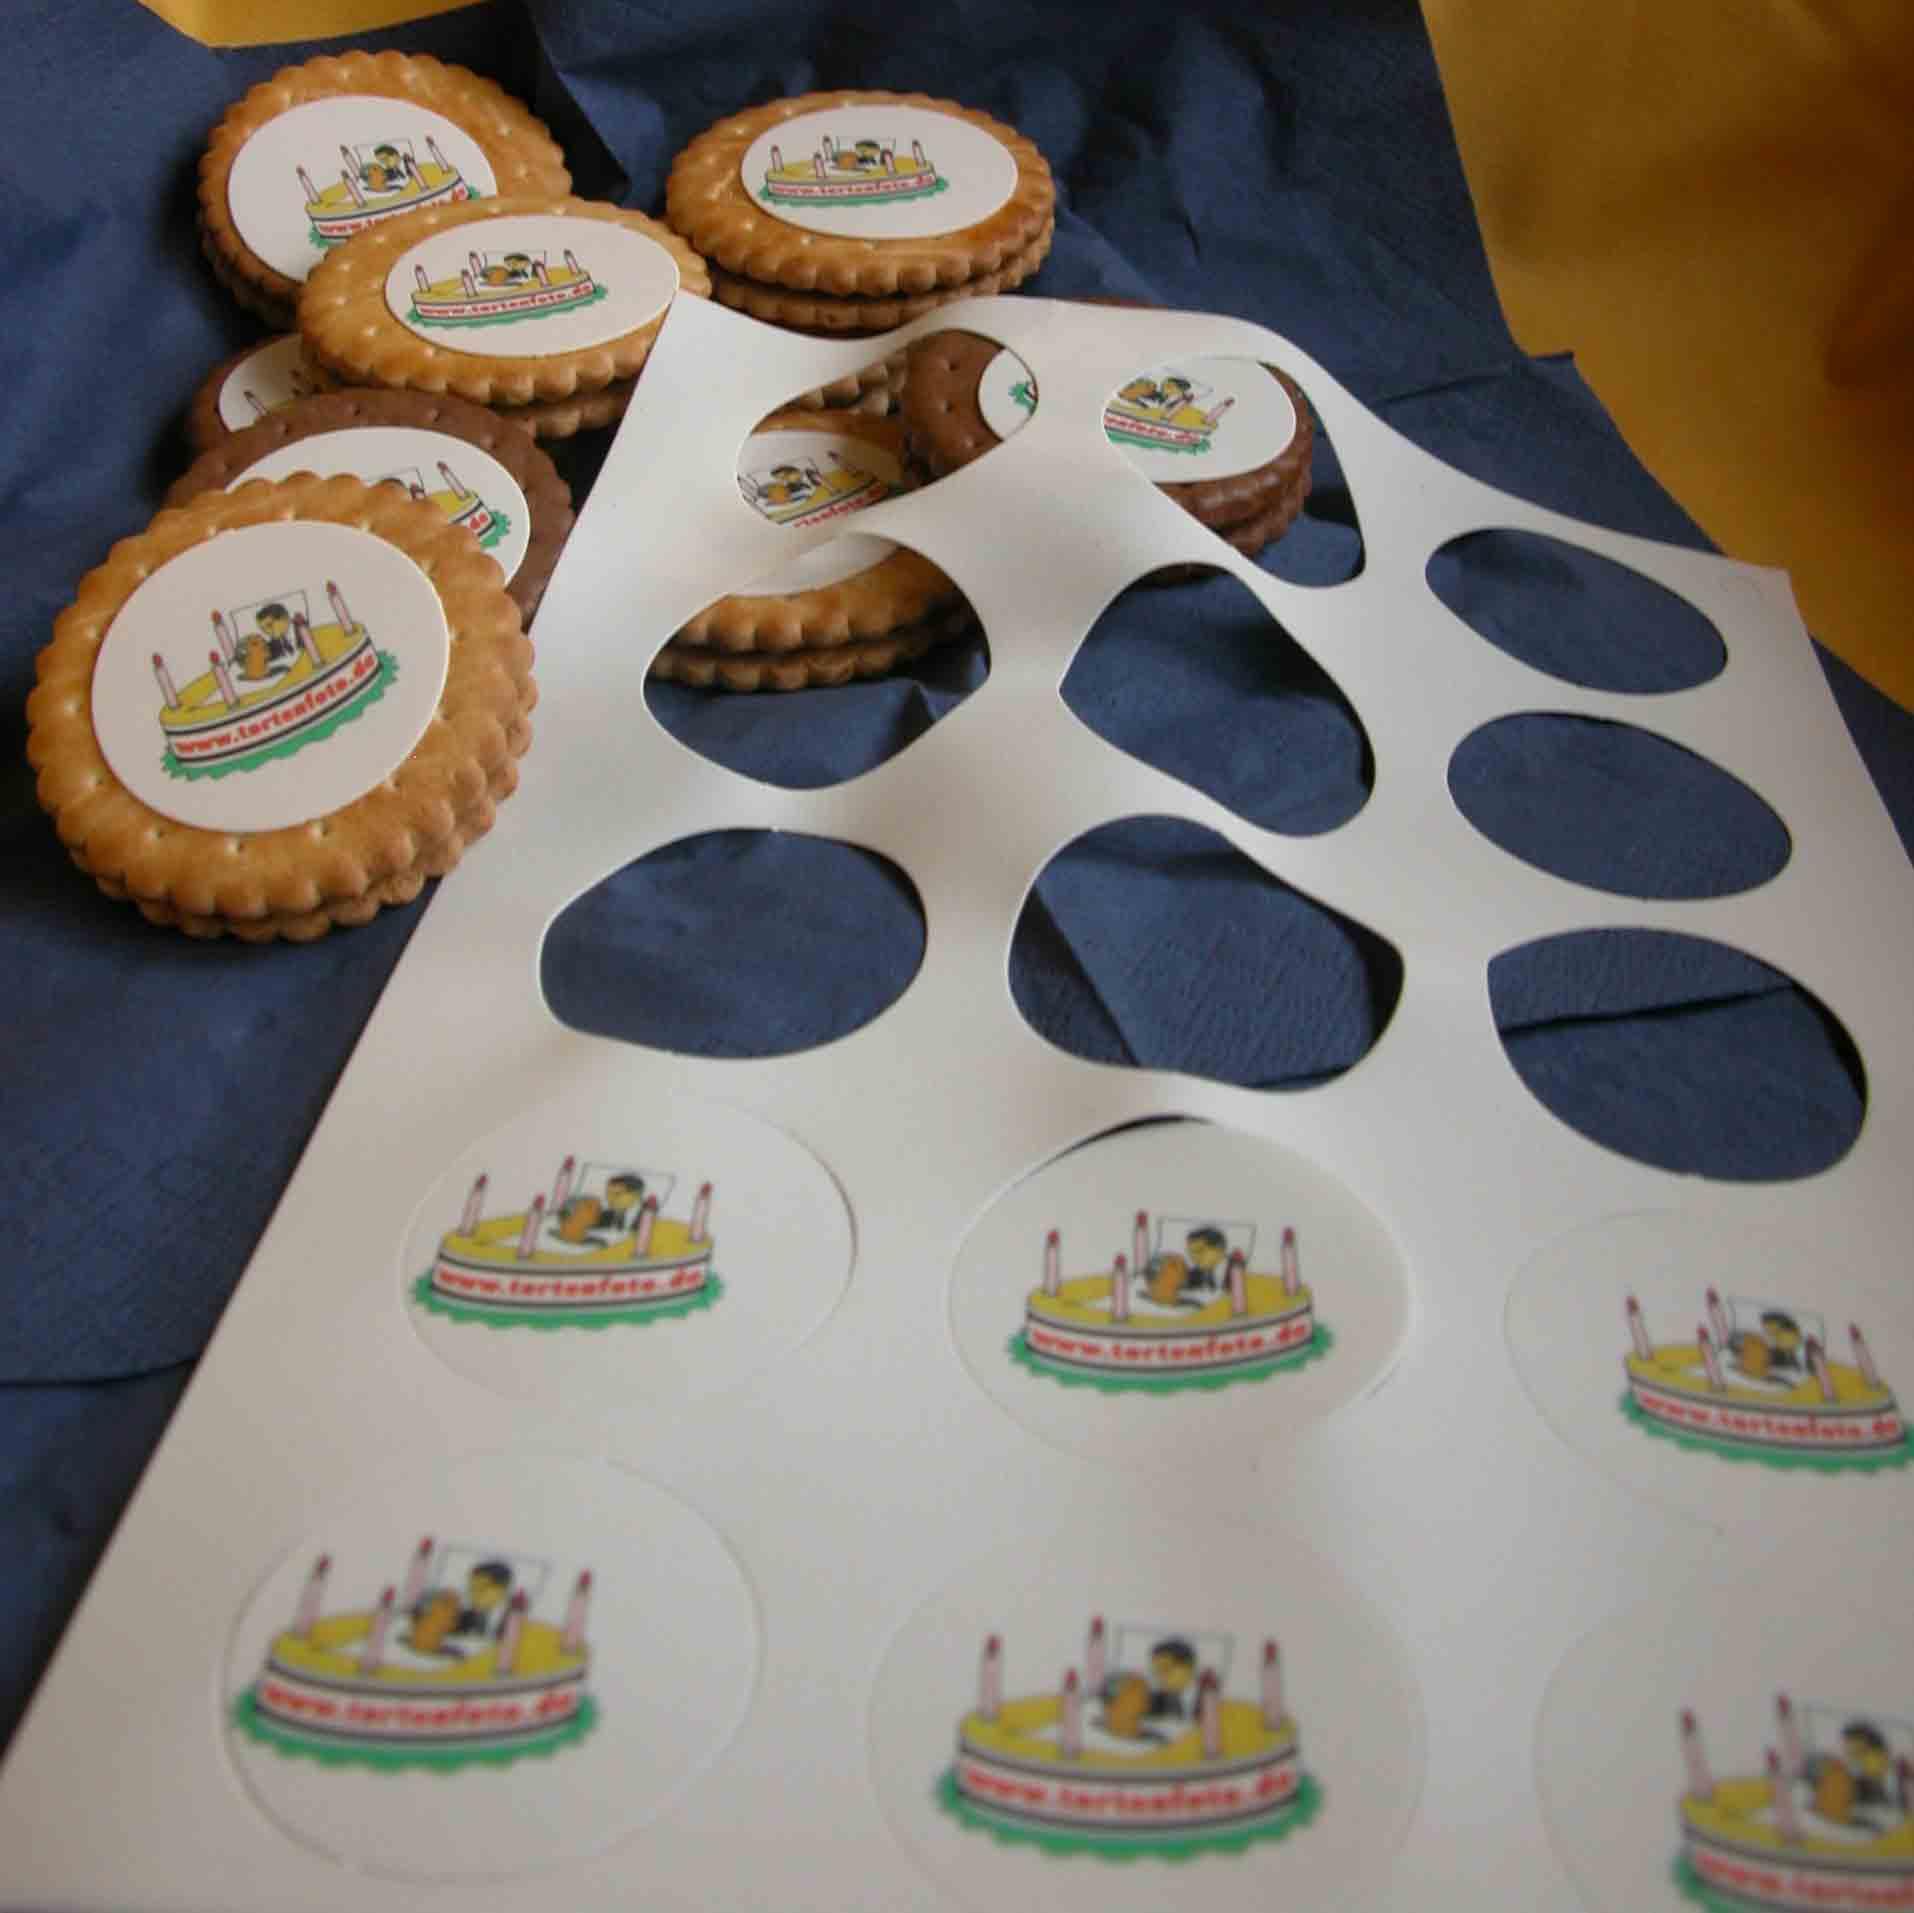 fototorte pre cuts cup cake schaumk sse muffins bestellschein kekse muffins essbare. Black Bedroom Furniture Sets. Home Design Ideas